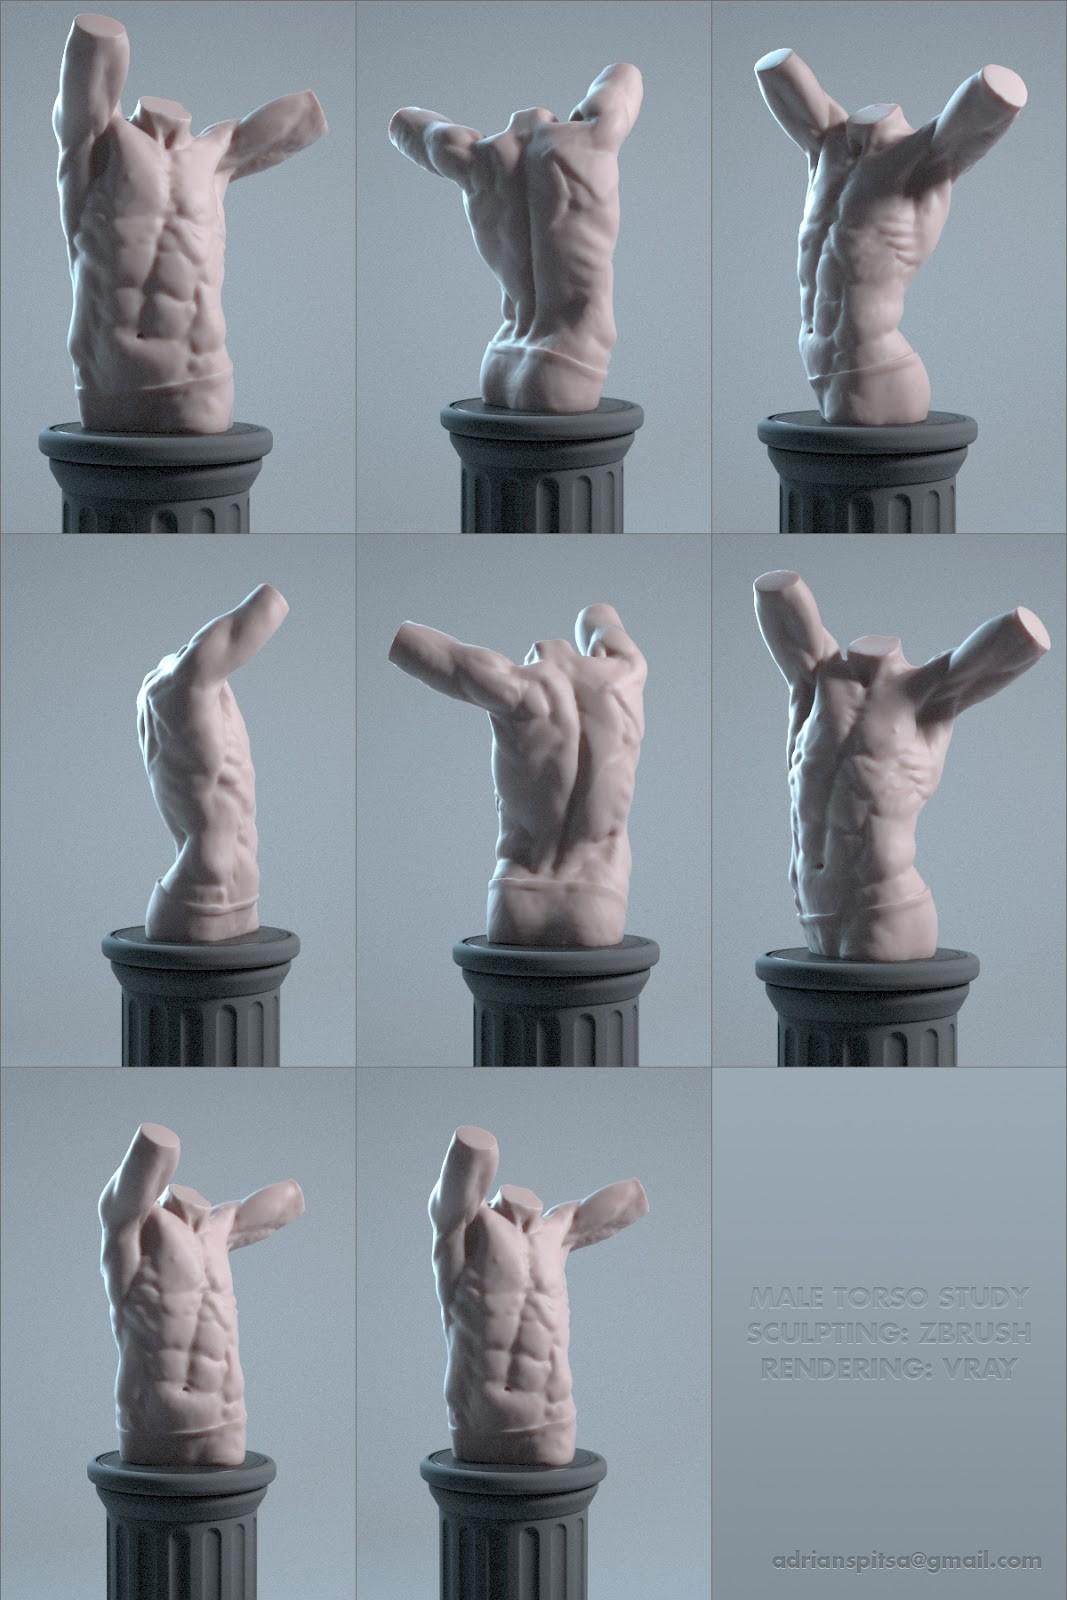 Adrian spitsa male torso sculpting